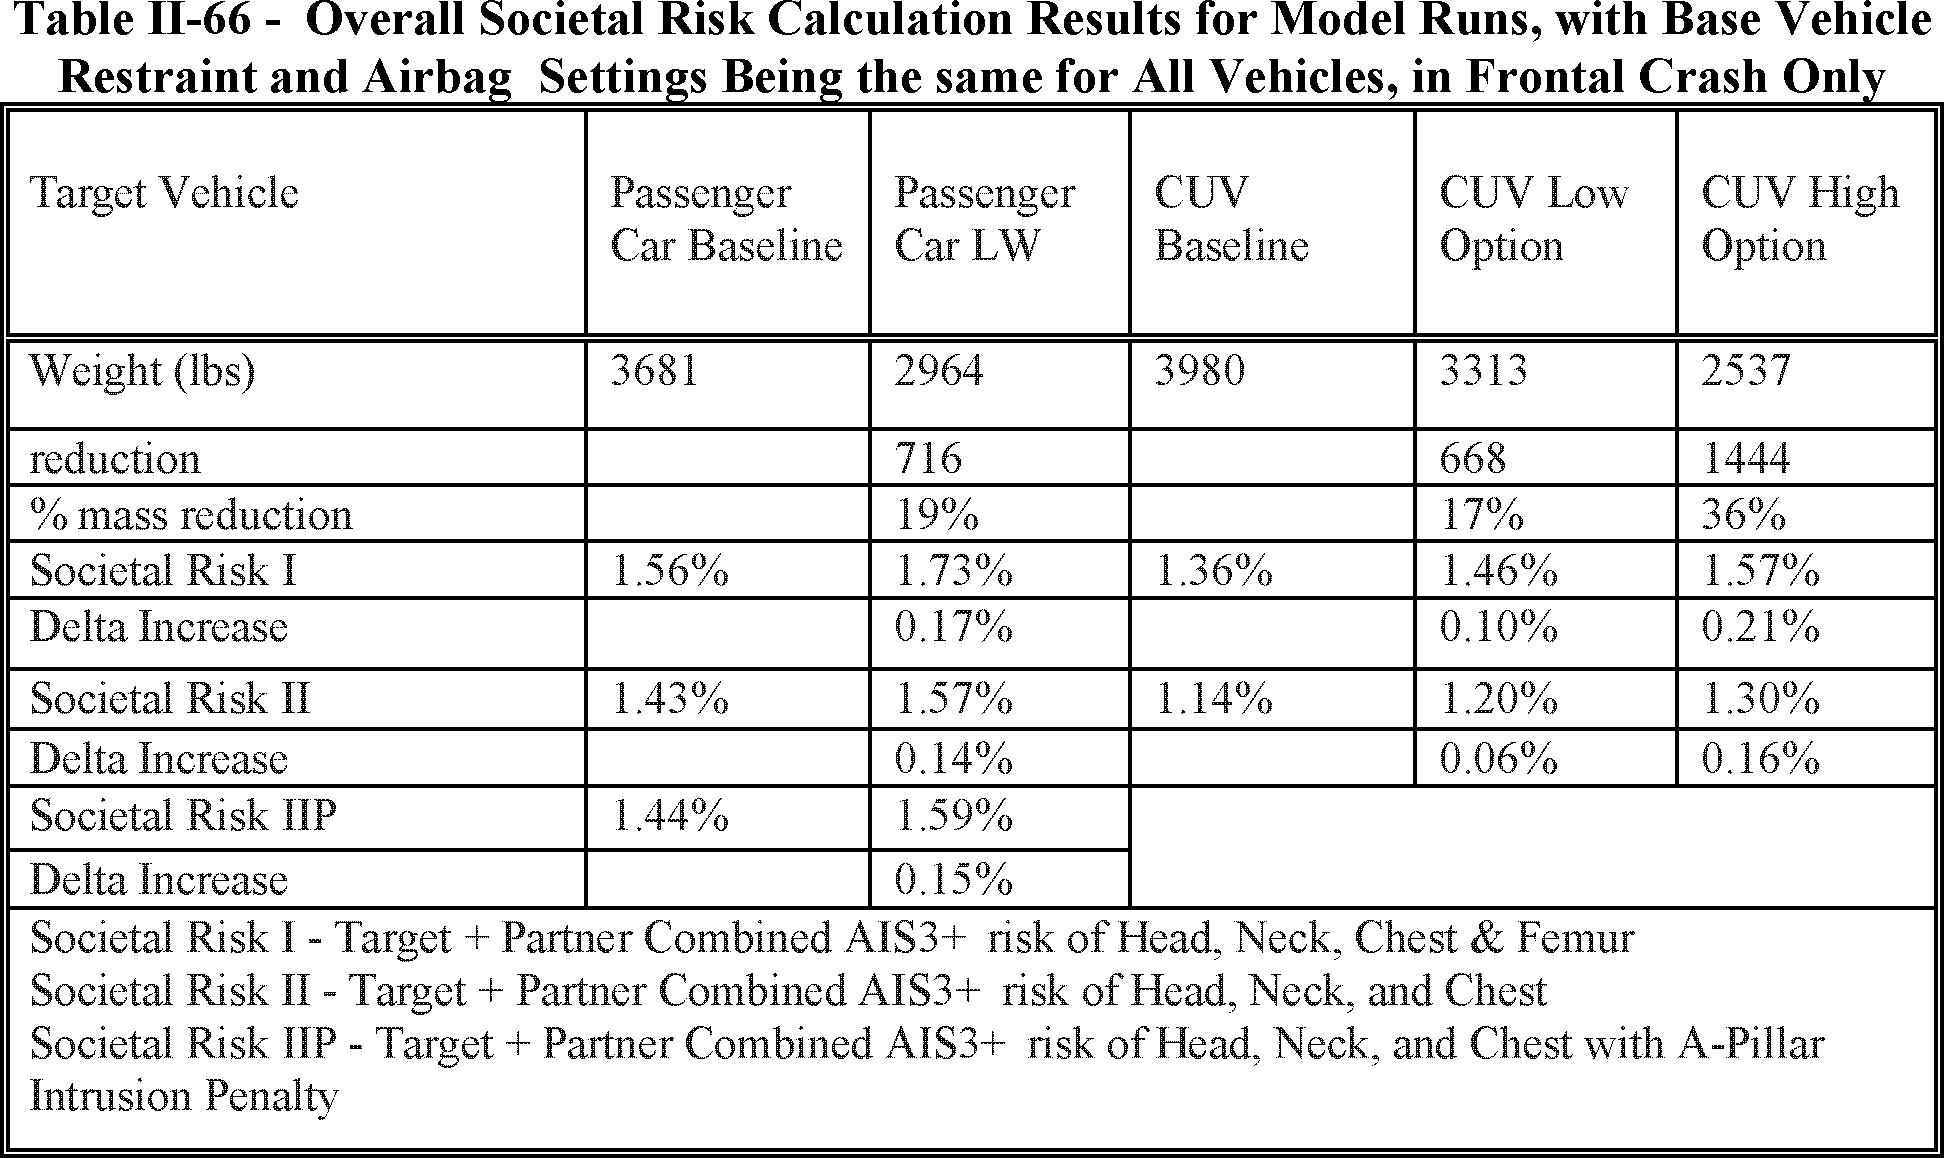 Federal Register :: The Safer Affordable Fuel-Efficient (SAFE ... on nissan battery diagram, nissan diesel conversion, nissan chassis diagram, nissan ignition key, nissan brakes diagram, nissan transaxle, nissan repair guide, nissan electrical diagrams, nissan radiator diagram, nissan fuel system diagram, nissan distributor diagram, nissan schematic diagram, nissan wire harness diagram, nissan repair diagrams, nissan engine diagram, nissan main fuse, nissan ignition resistor, nissan fuel pump, nissan suspension diagram, nissan body diagram,